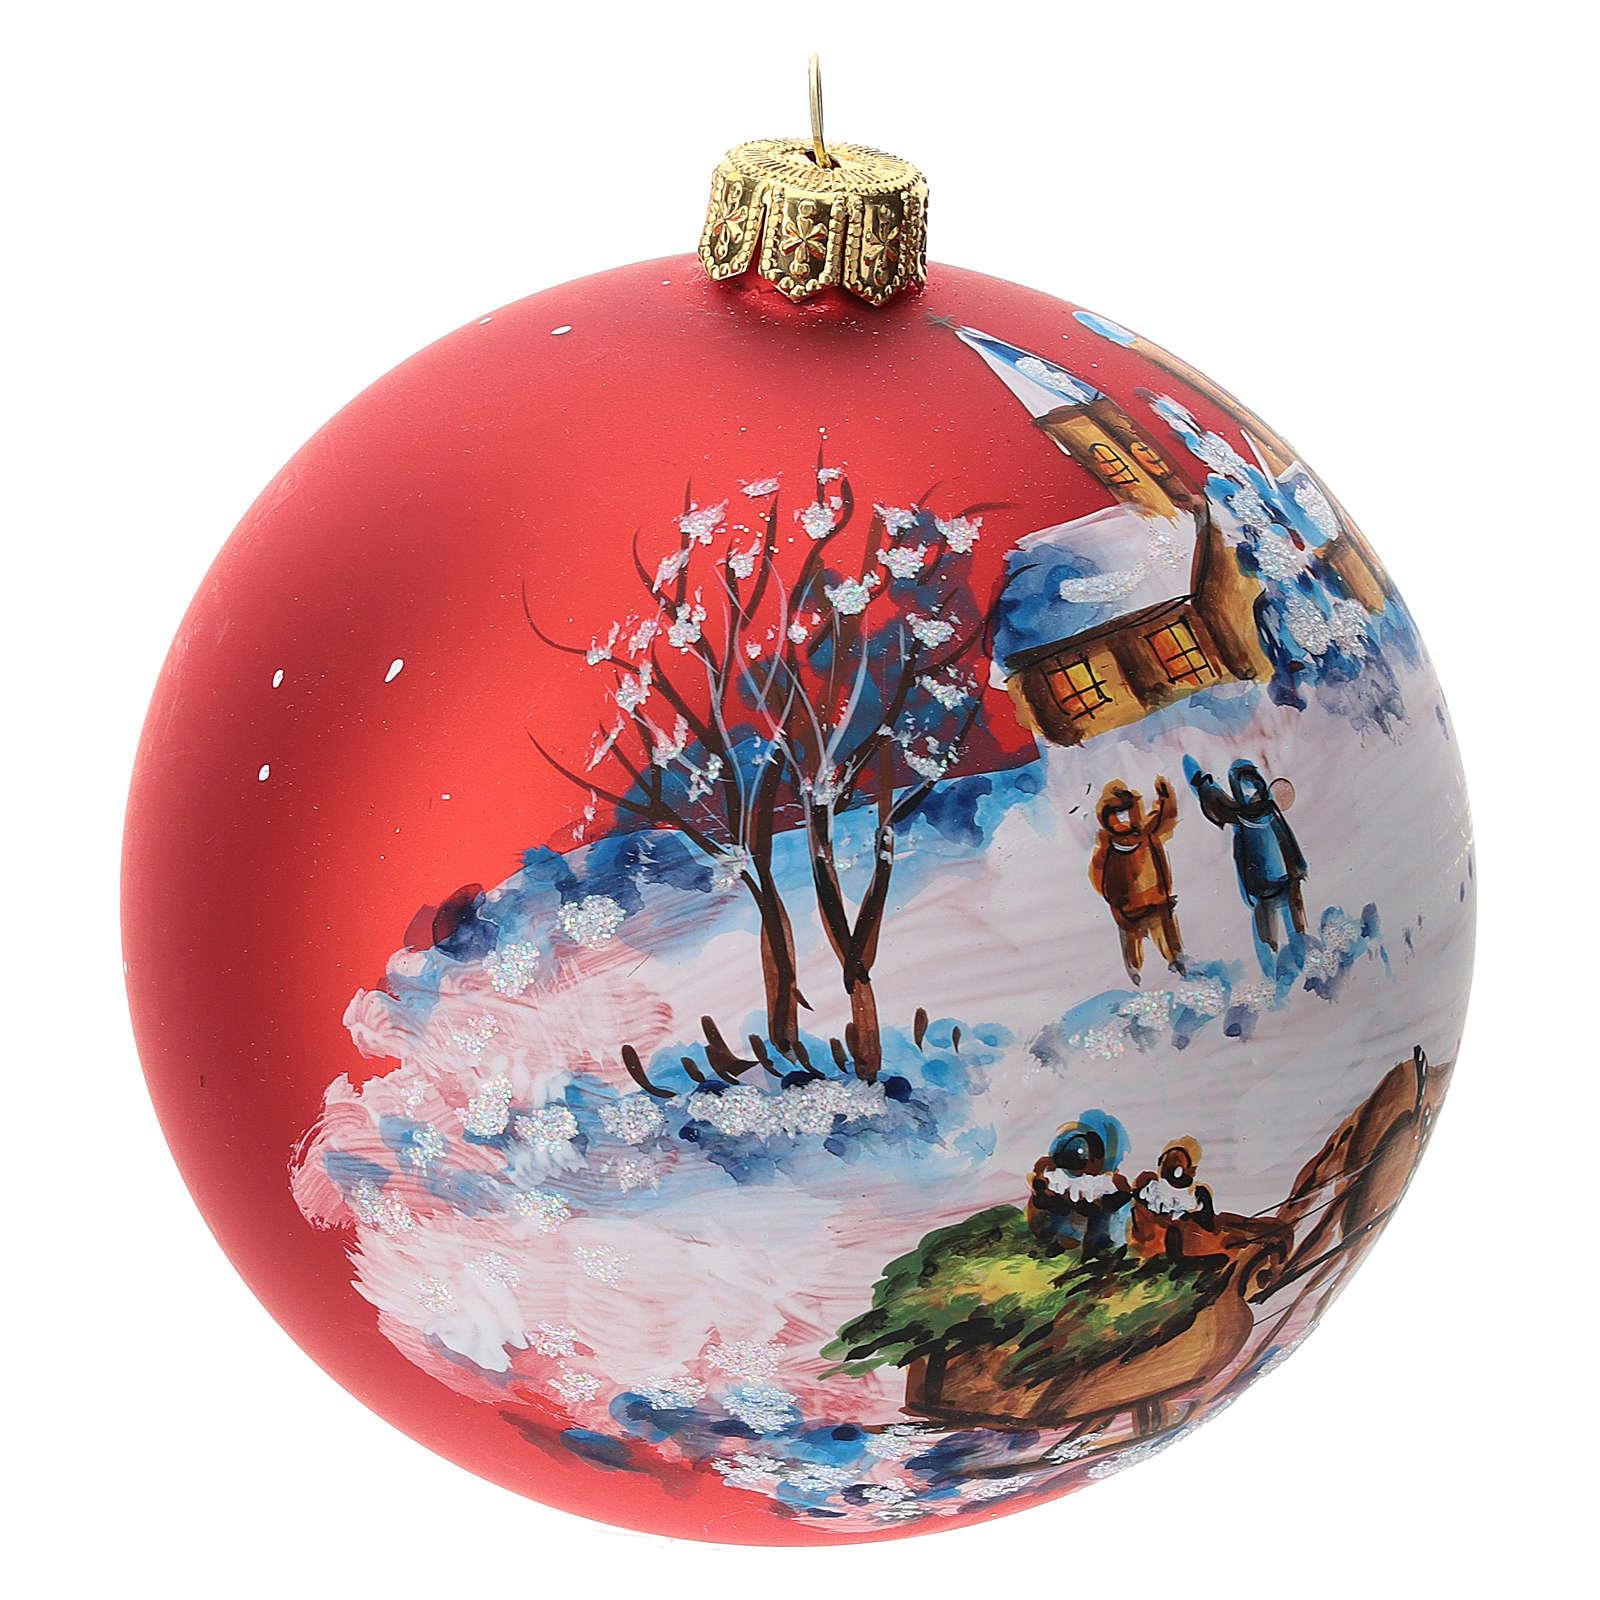 Bola árbol Navidad vidrio soplado roja motivo trineo papá Noel 100 mm 4